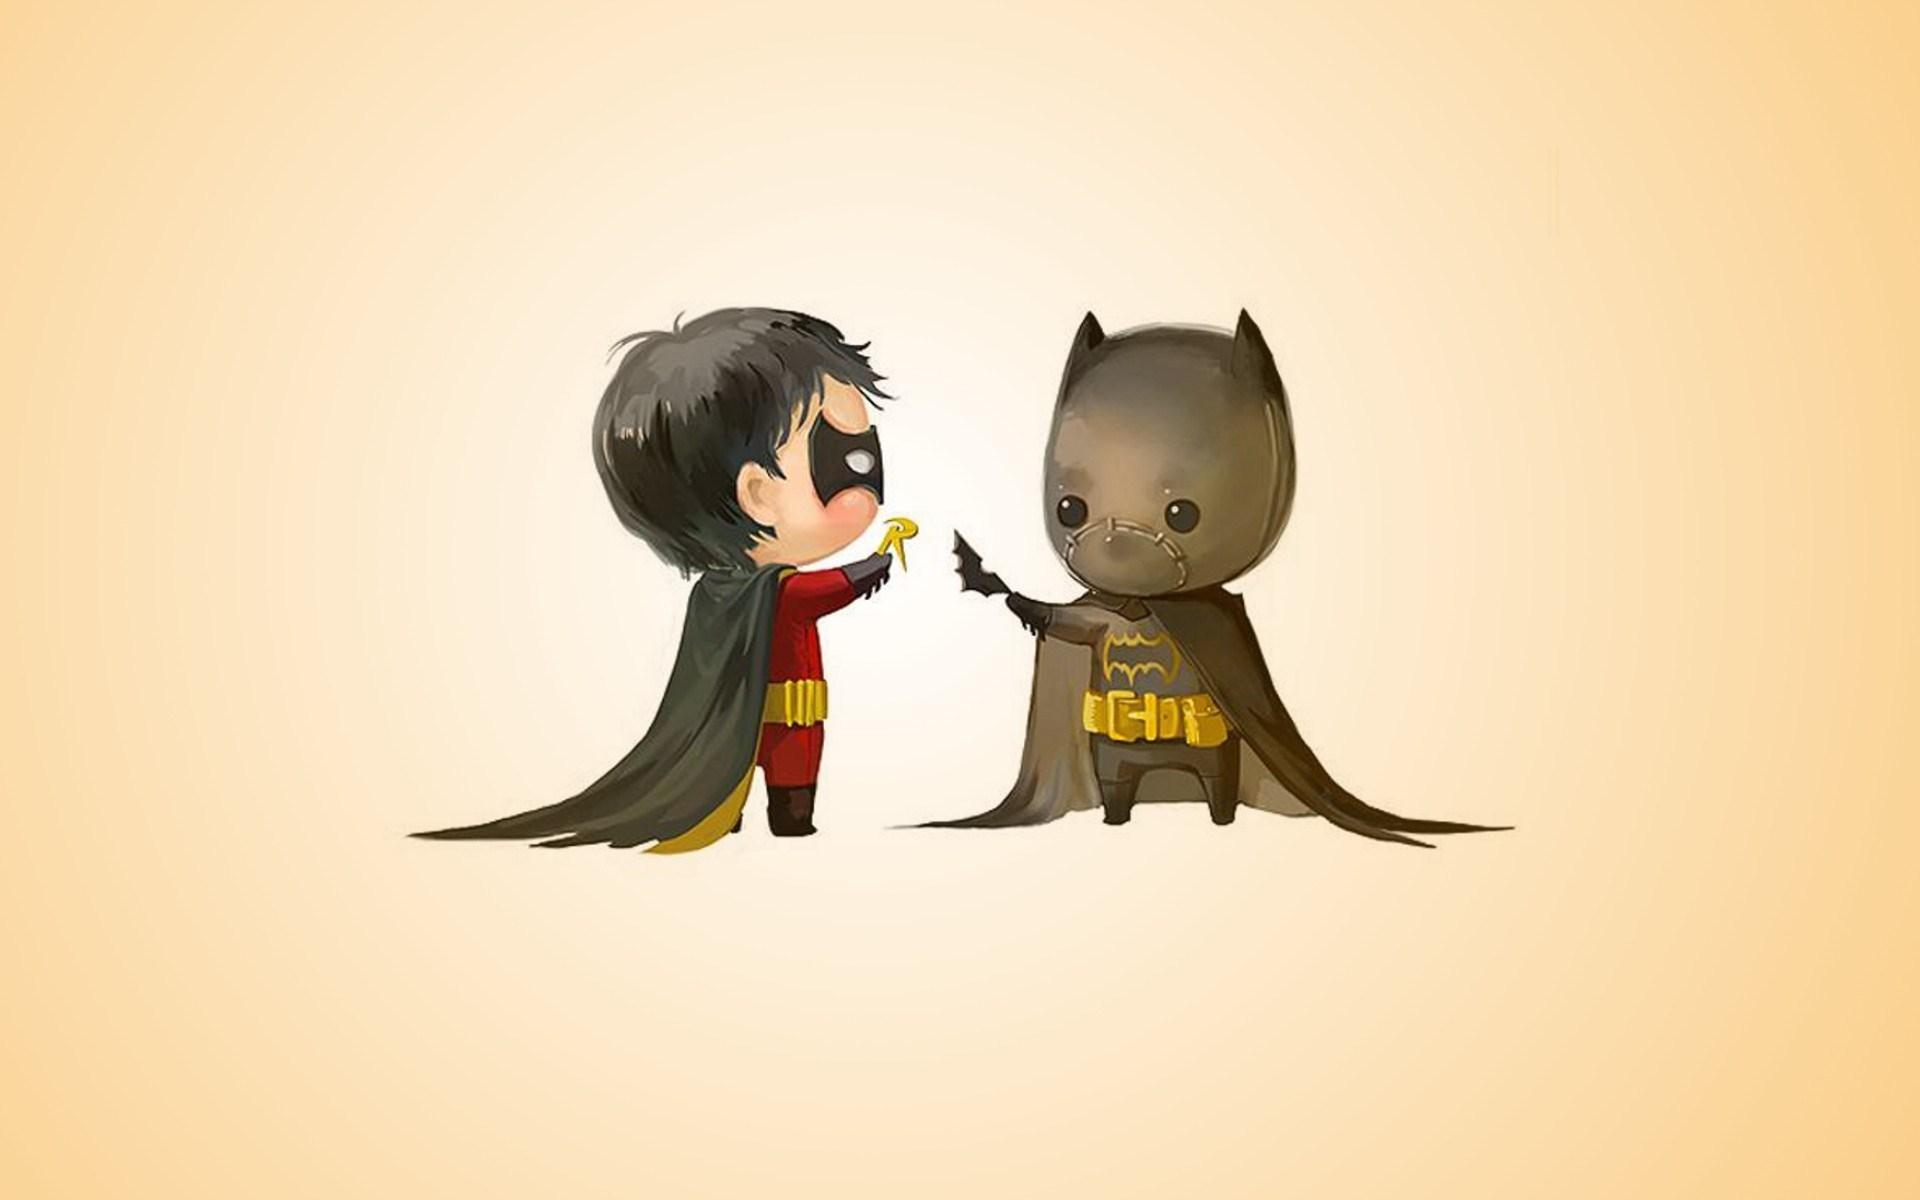 Batman and robin wallpaper hd wallpapersafari - Batman wallpaper cartoon ...